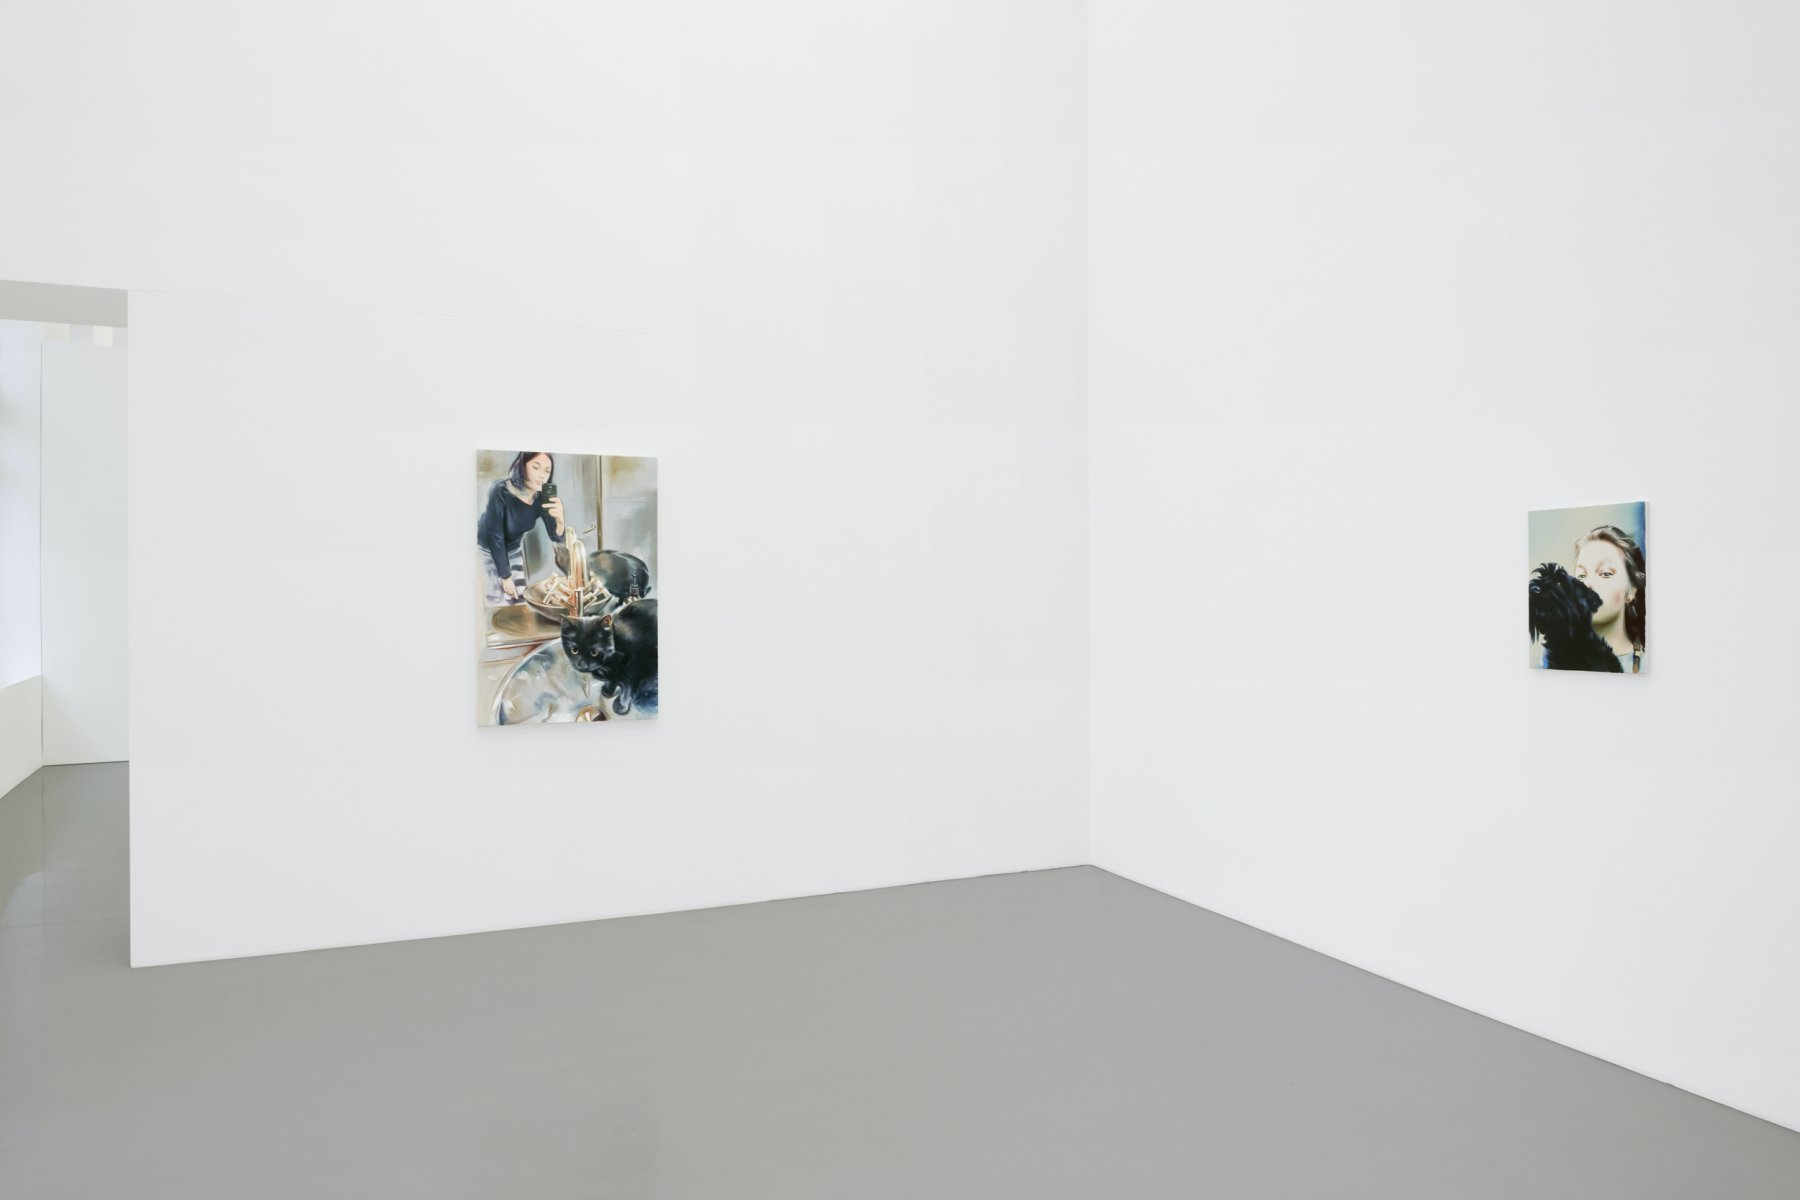 Galerie Meyer Kainer Marcin Maciejowski 1